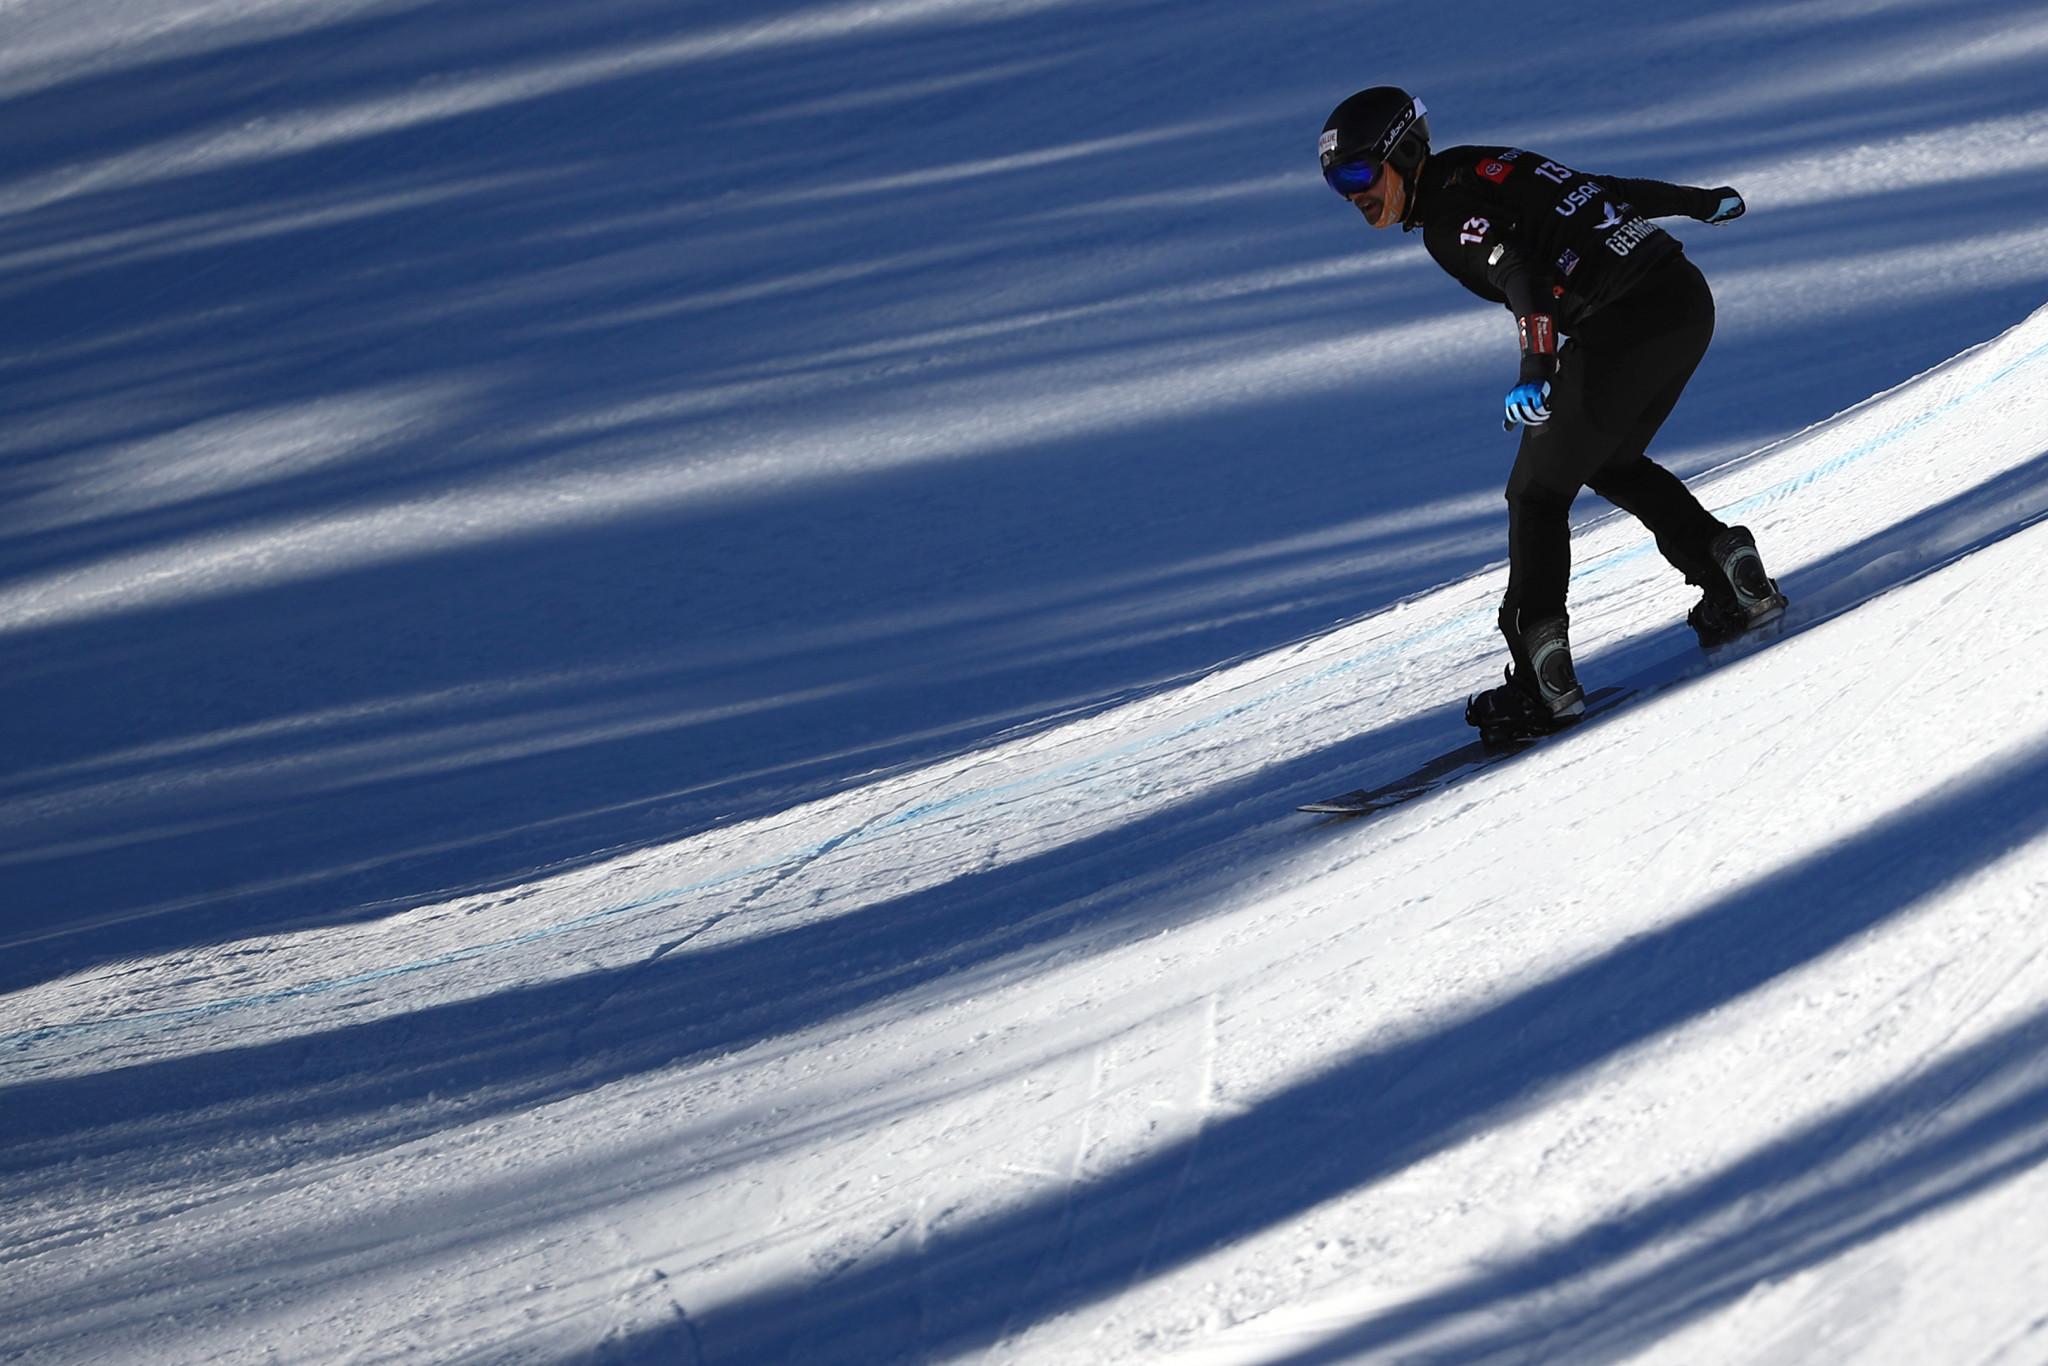 FIS Snowboard Cross World Cup season set to resume in Feldberg following break for World Championships